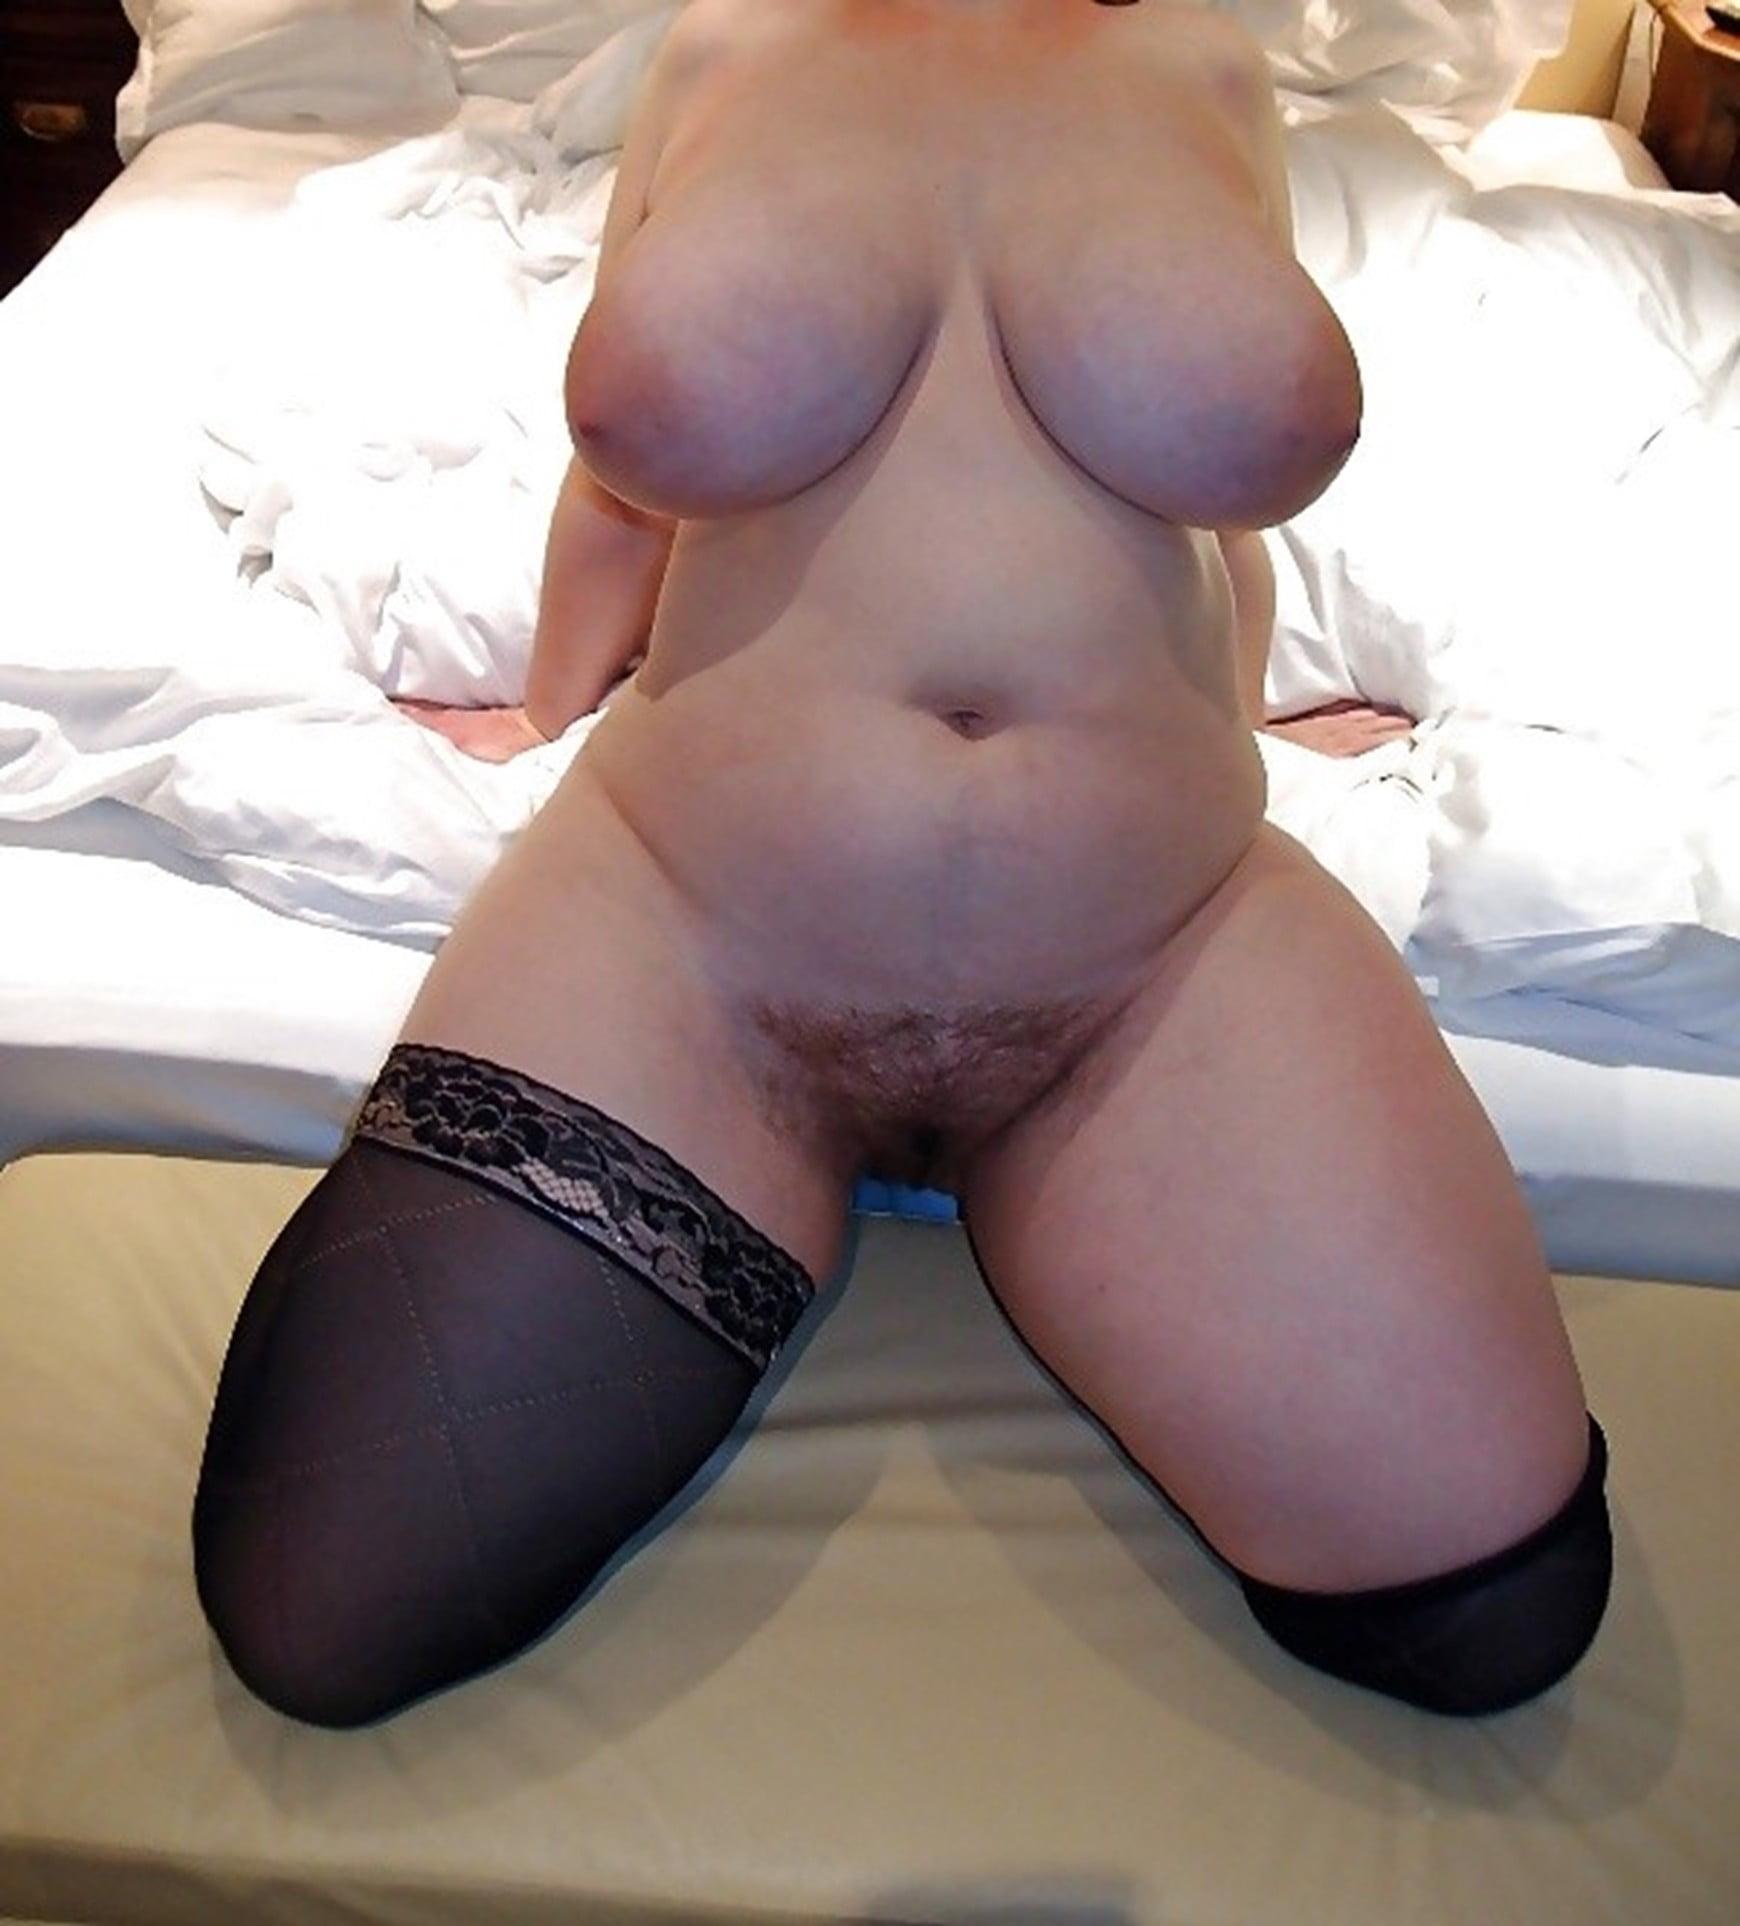 j aime le sexe sexe soft